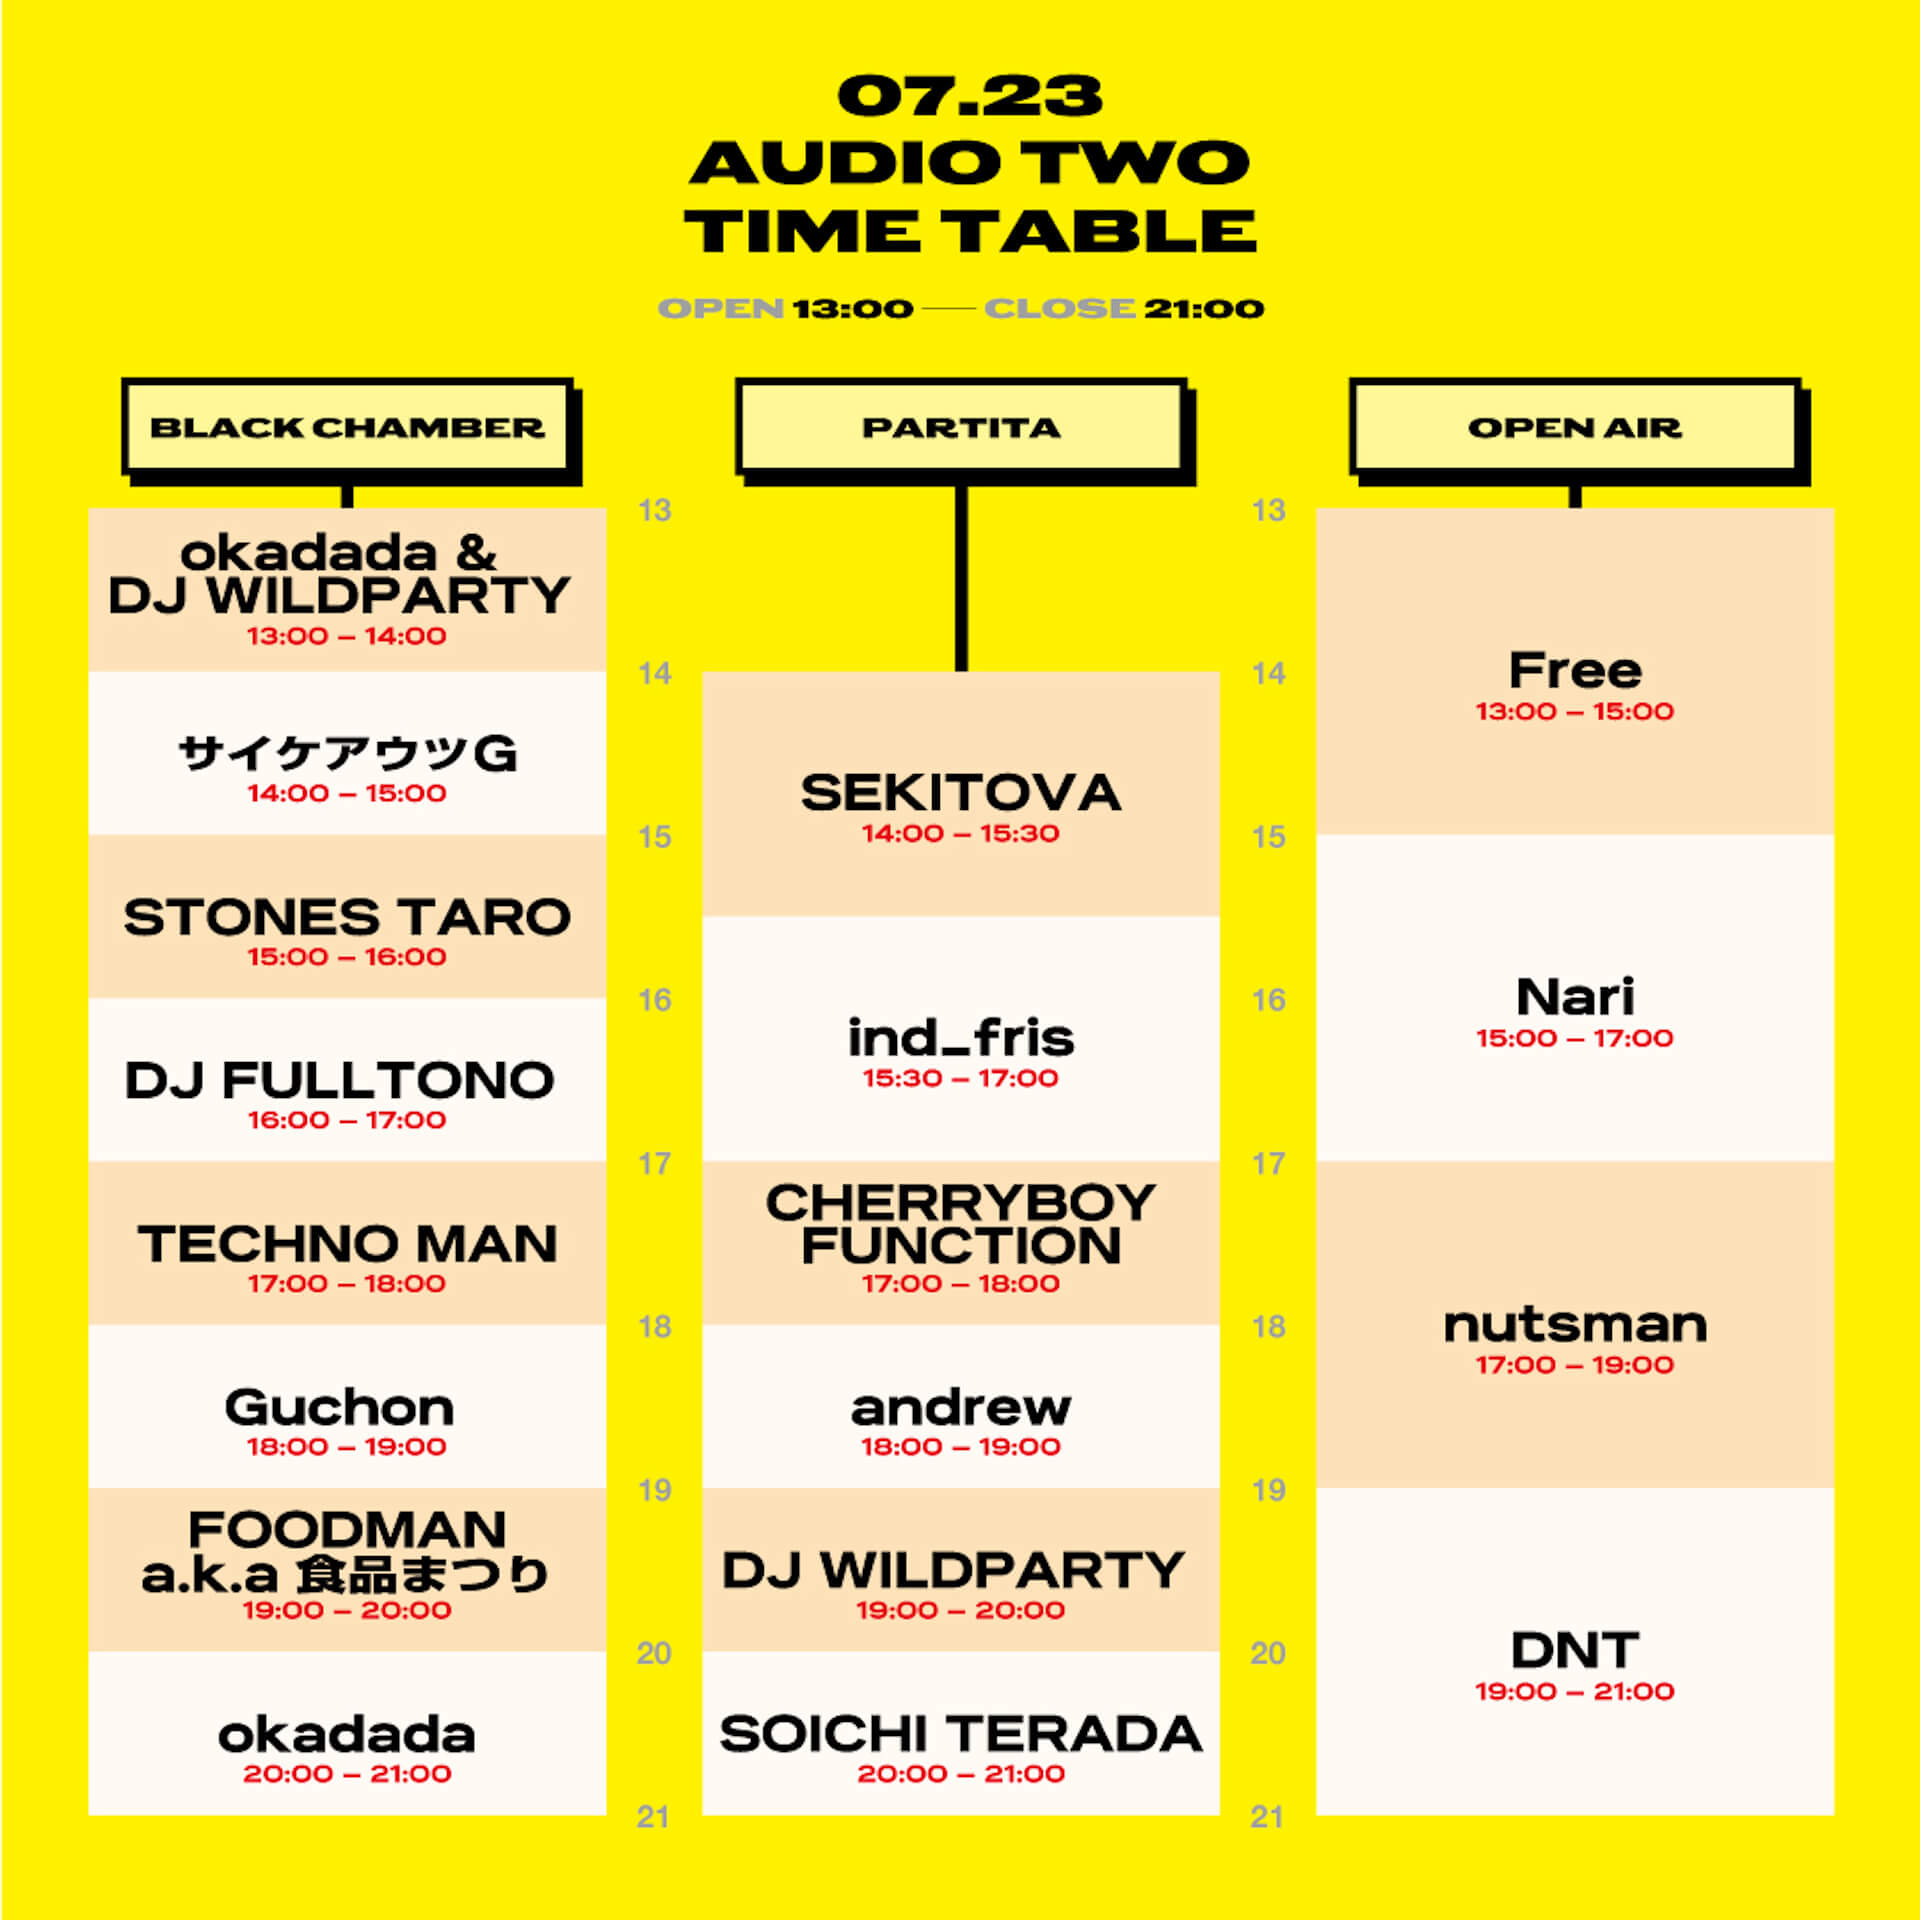 CIRCUS OSAKA9周年番外編<AUDIO TWO>のタイムテーブル&アフターパーティーが発表! music210720_circusosaka_audiotwo_1